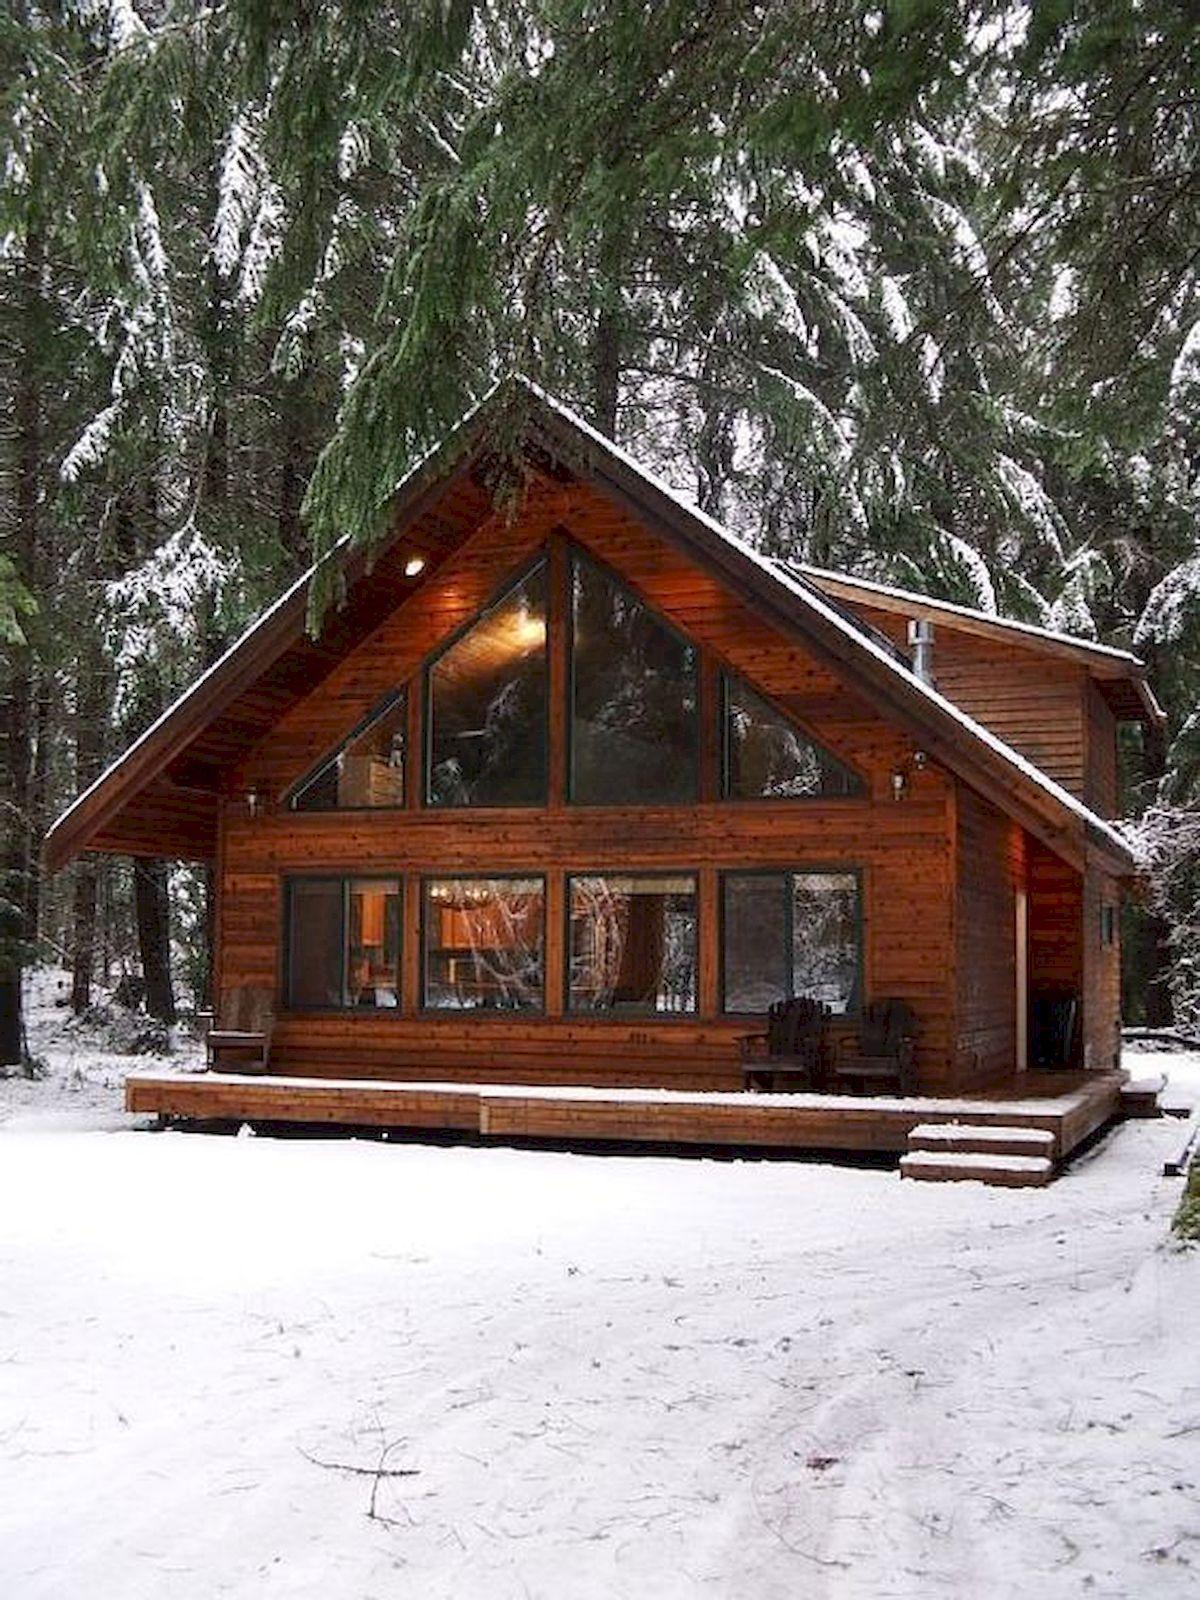 70 Fantastic Small Log Cabin Homes Design Ideas Coachdecor Com Cabin Coachdec Cabin Coachdec Coac In 2020 Small Log Cabin Cabin Plans With Loft Log Cabin Homes